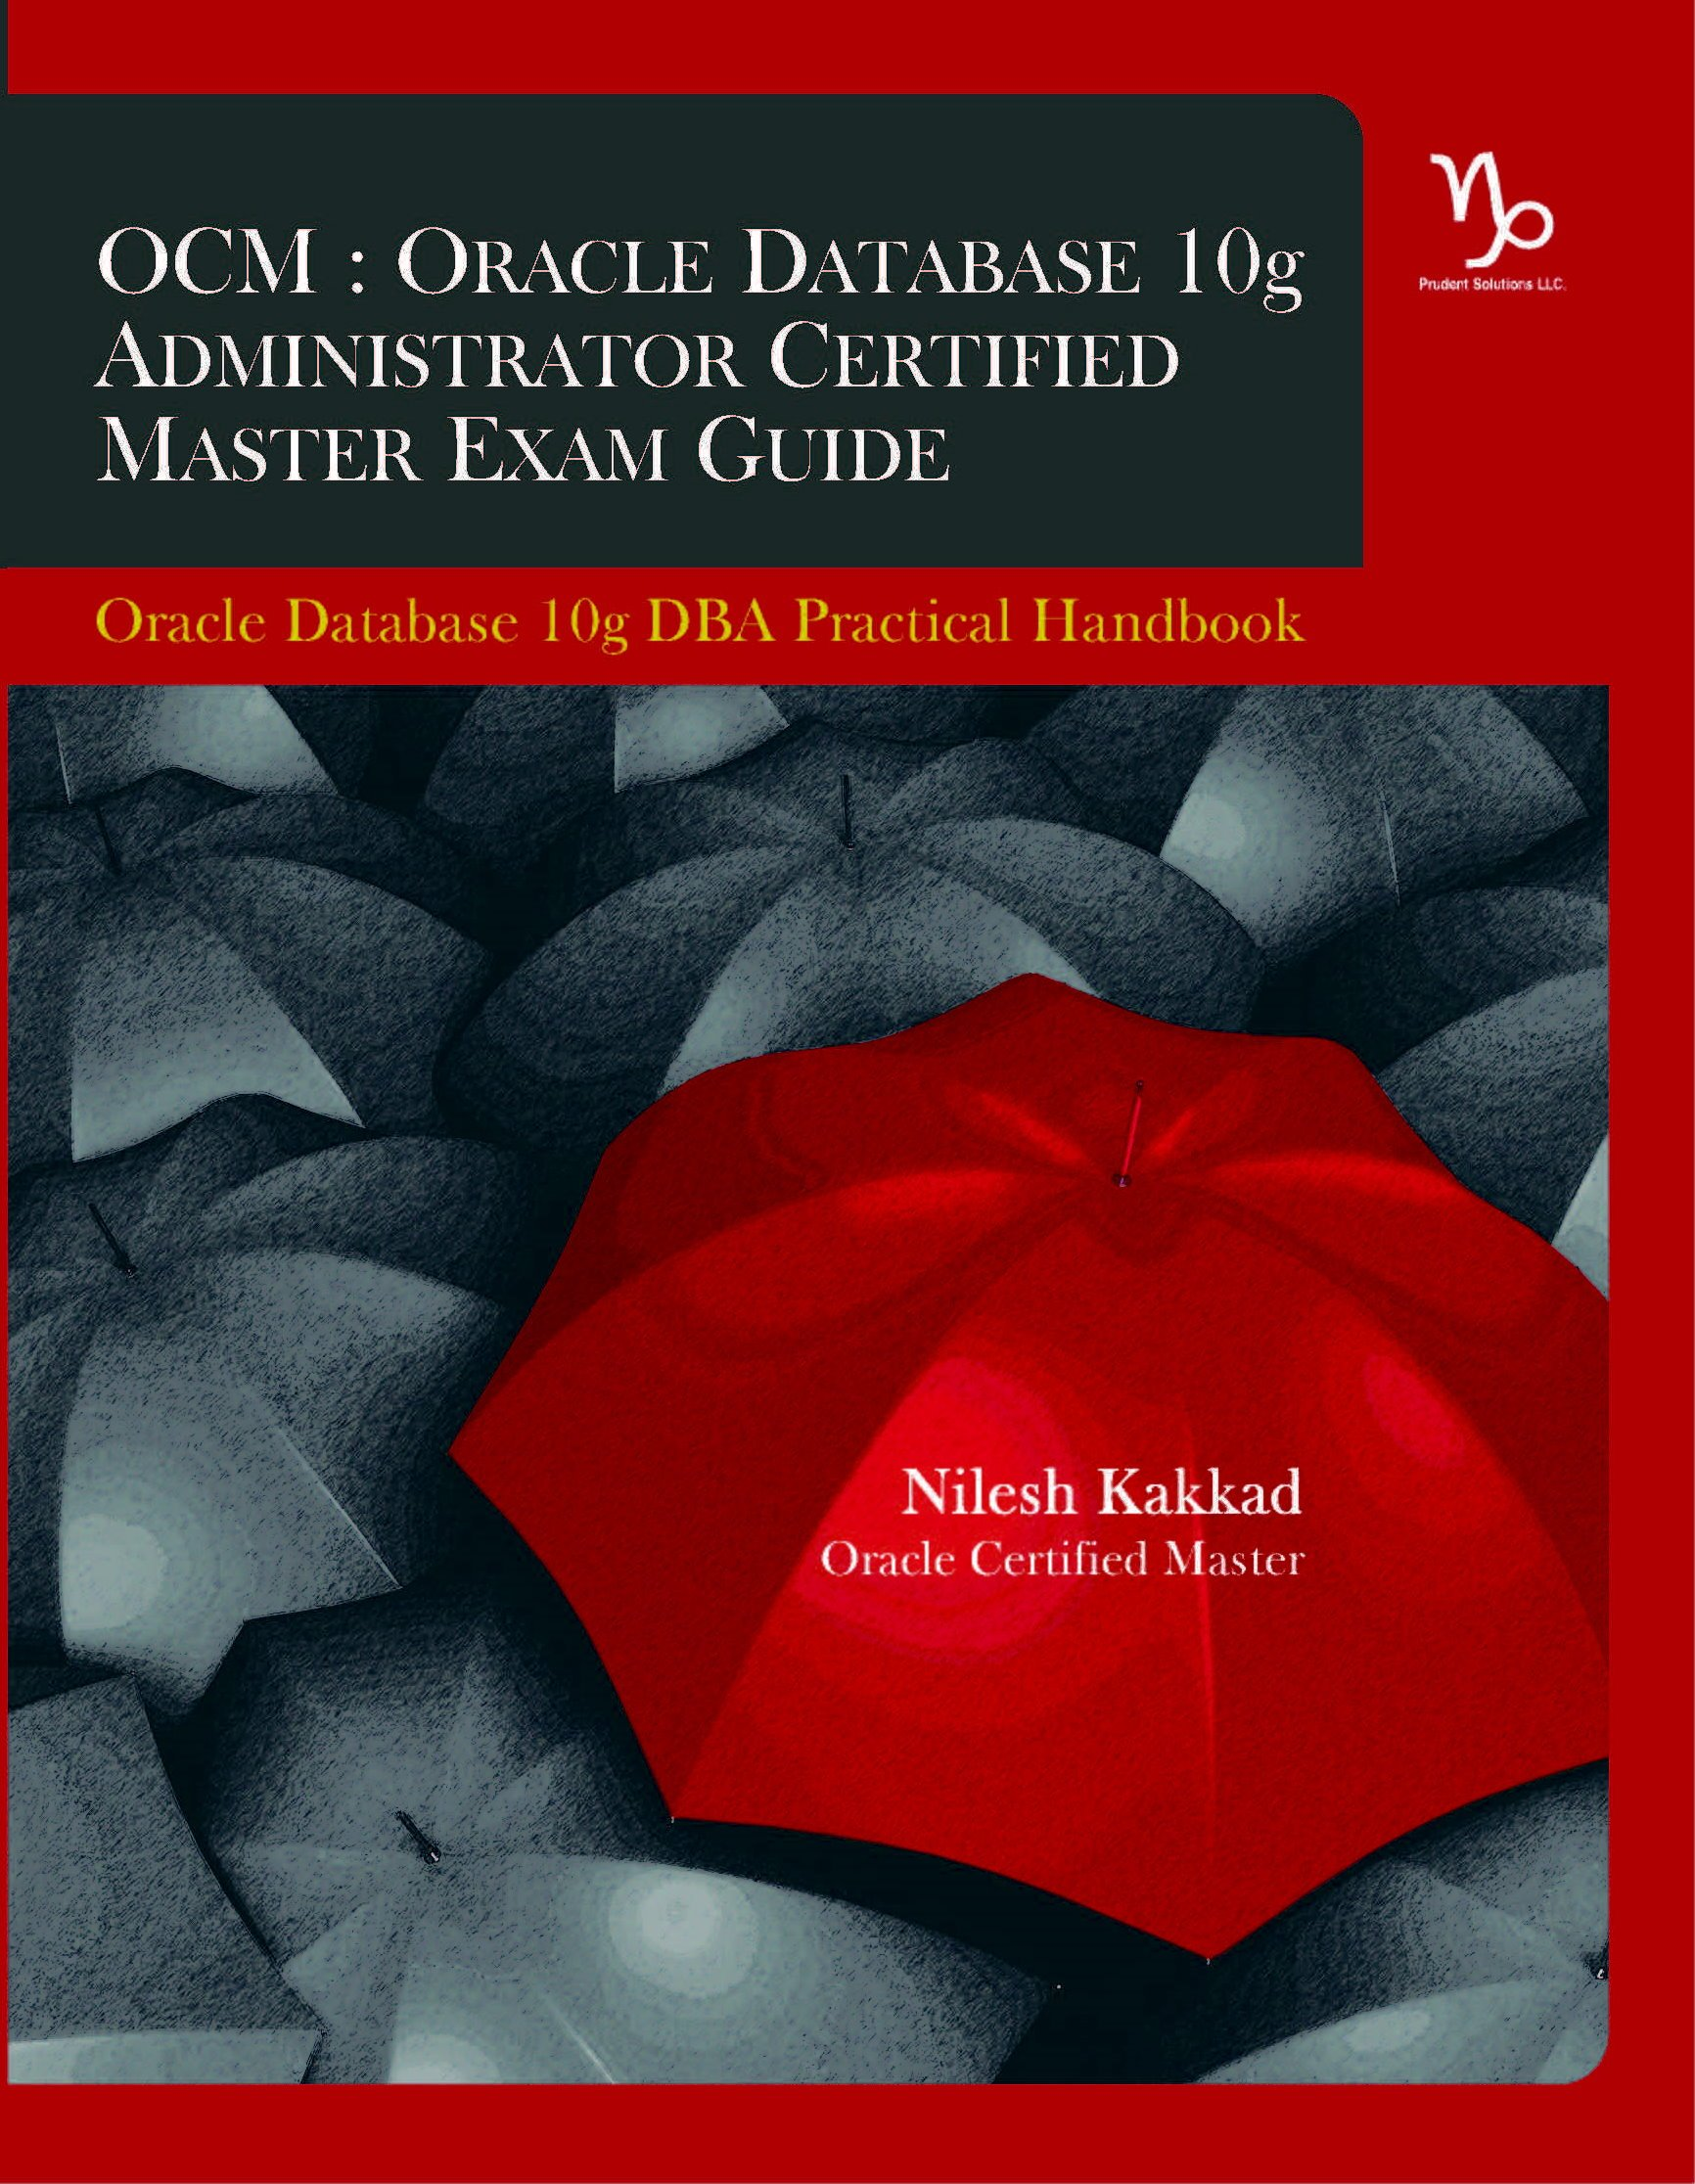 Ocm oracle database 10g administrator certified master exam guide ocm oracle database 10g administrator certified master exam guide nilesh kakkad prudents team 9780615481937 amazon books baditri Choice Image